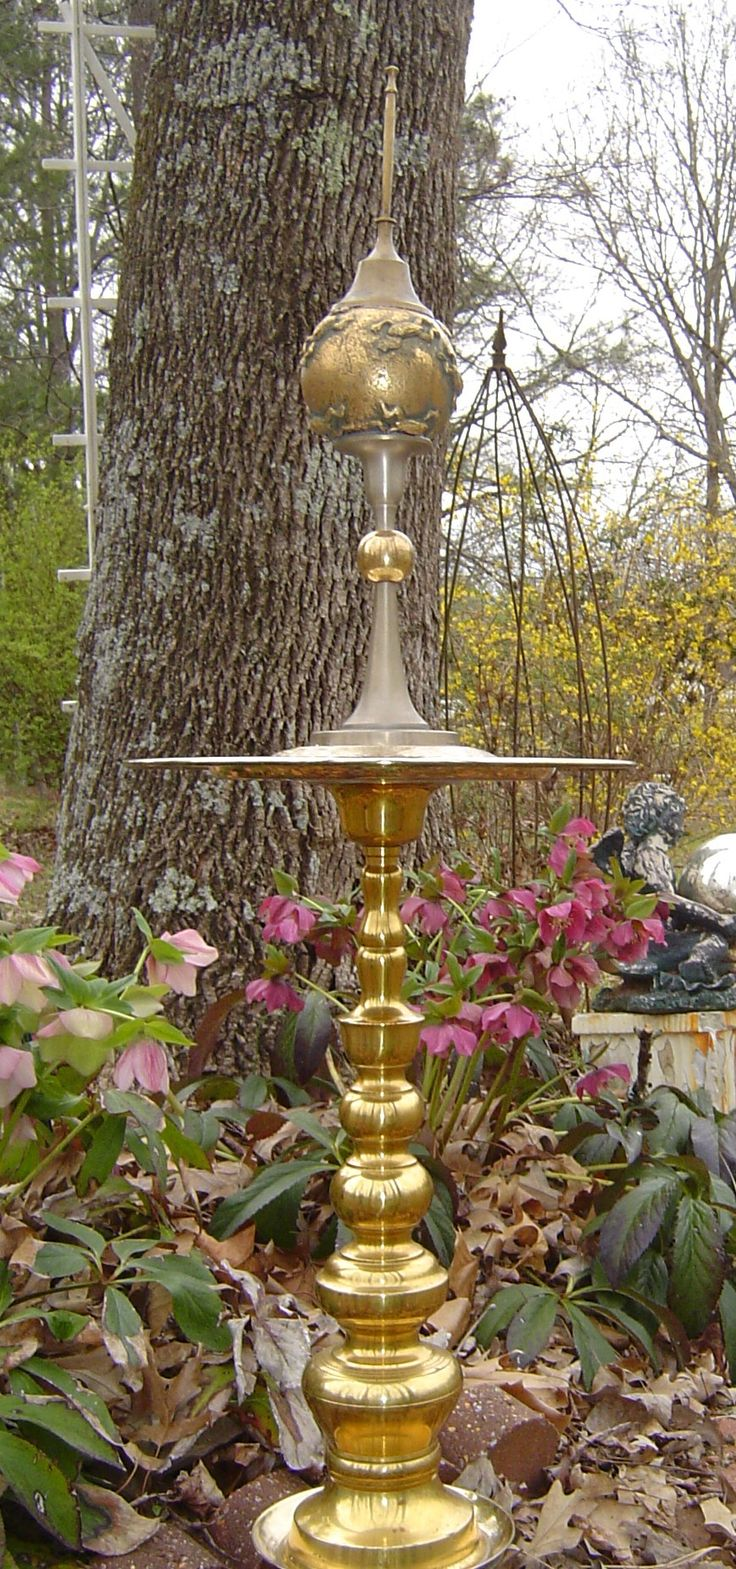 Poppy flower stake garden art poppy strong metal yard art flower - Recycled Garden Sculpture